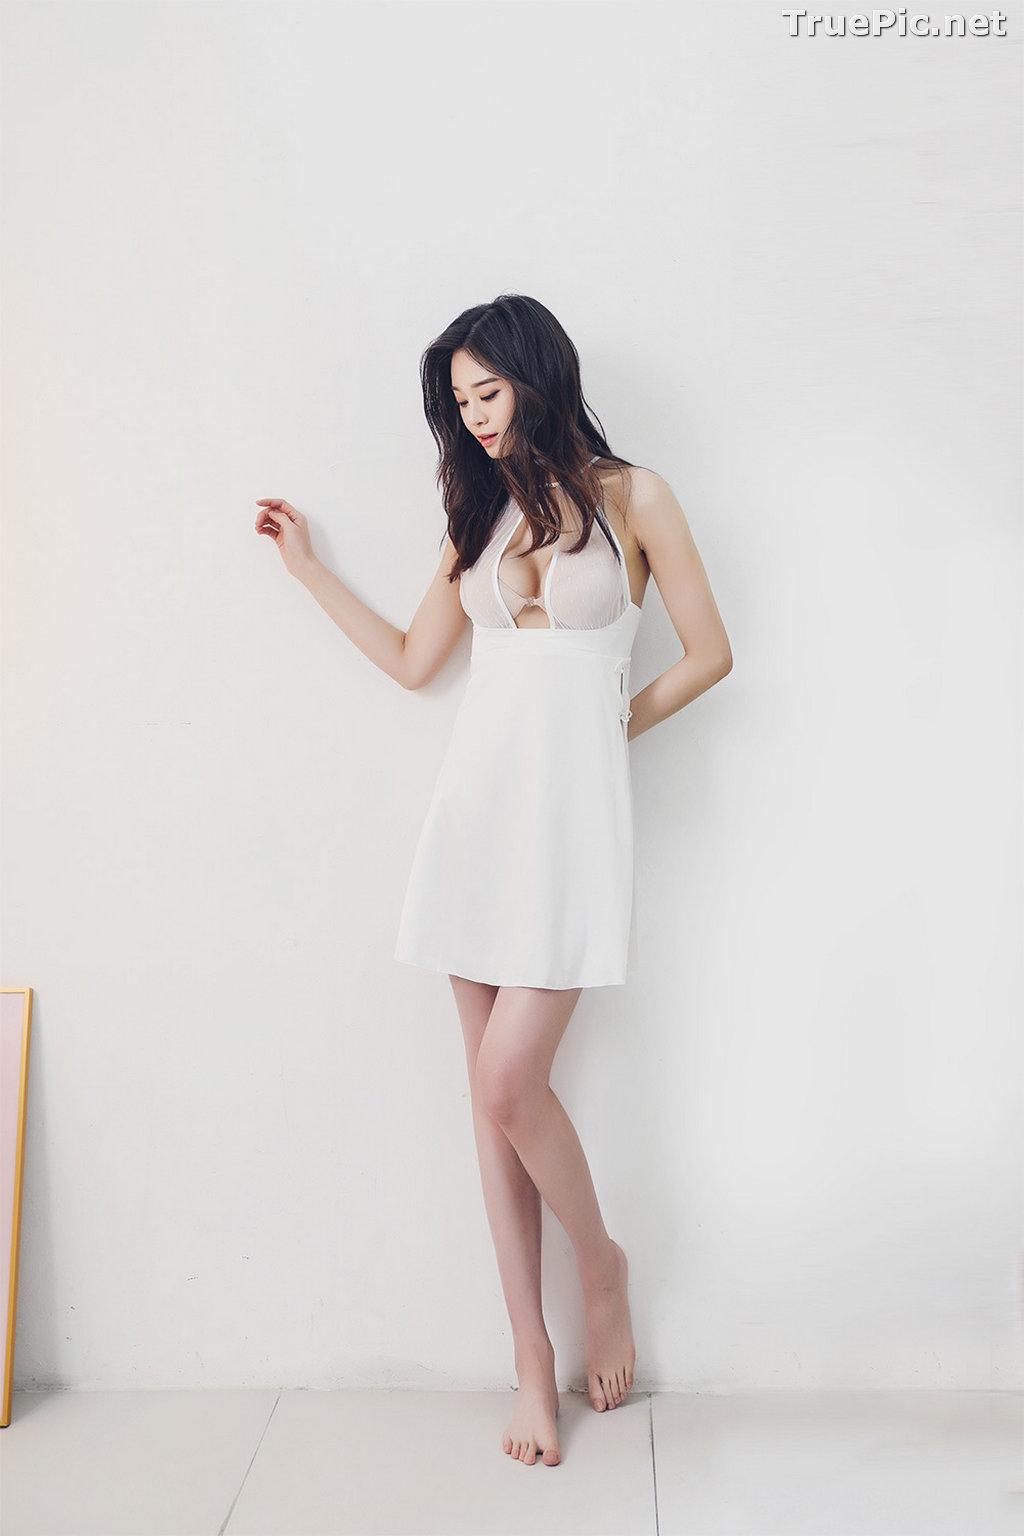 Image Korean Fashion Model - Carmen - White Sleepwear and Lingerie - TruePic.net - Picture-6